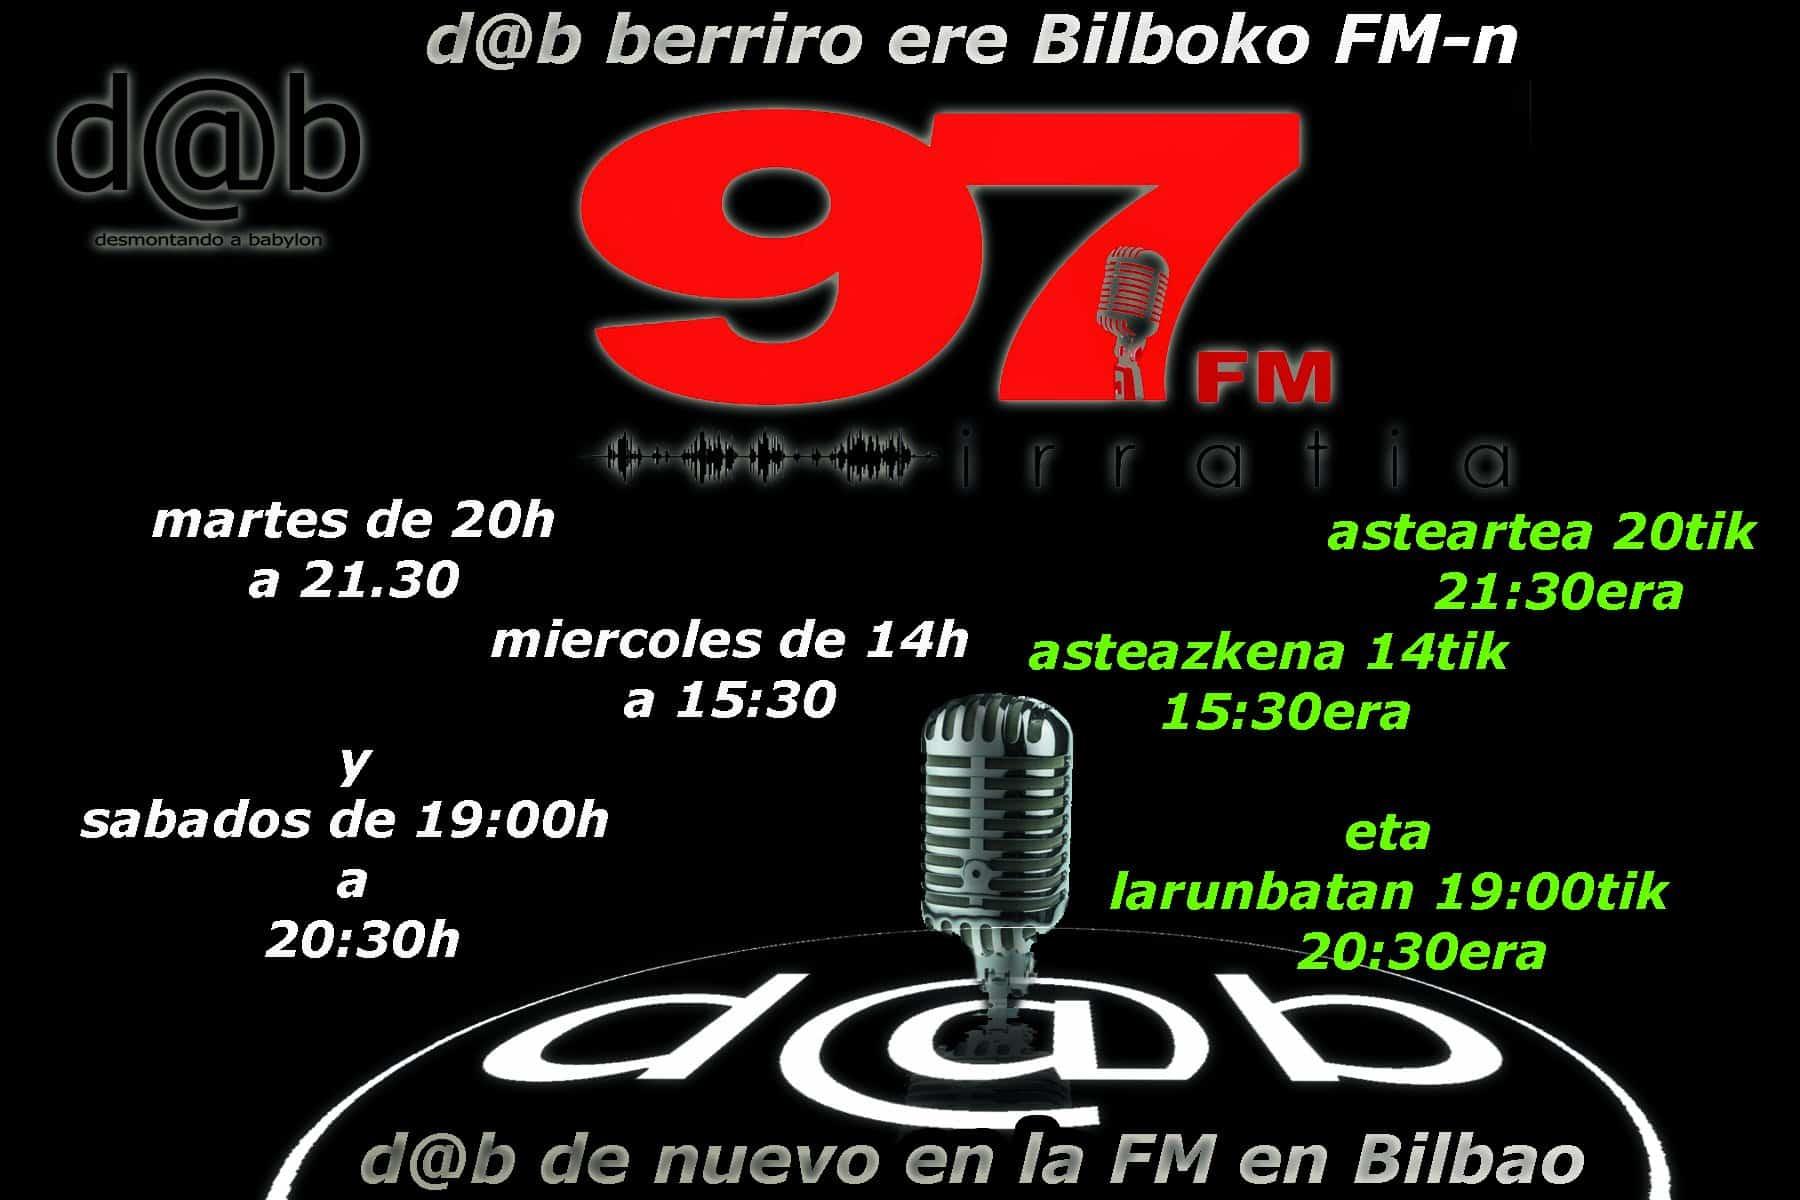 Desmontando a Babylon: d@b  radio  berriro  ere  Bilbo-ko  uhinetan